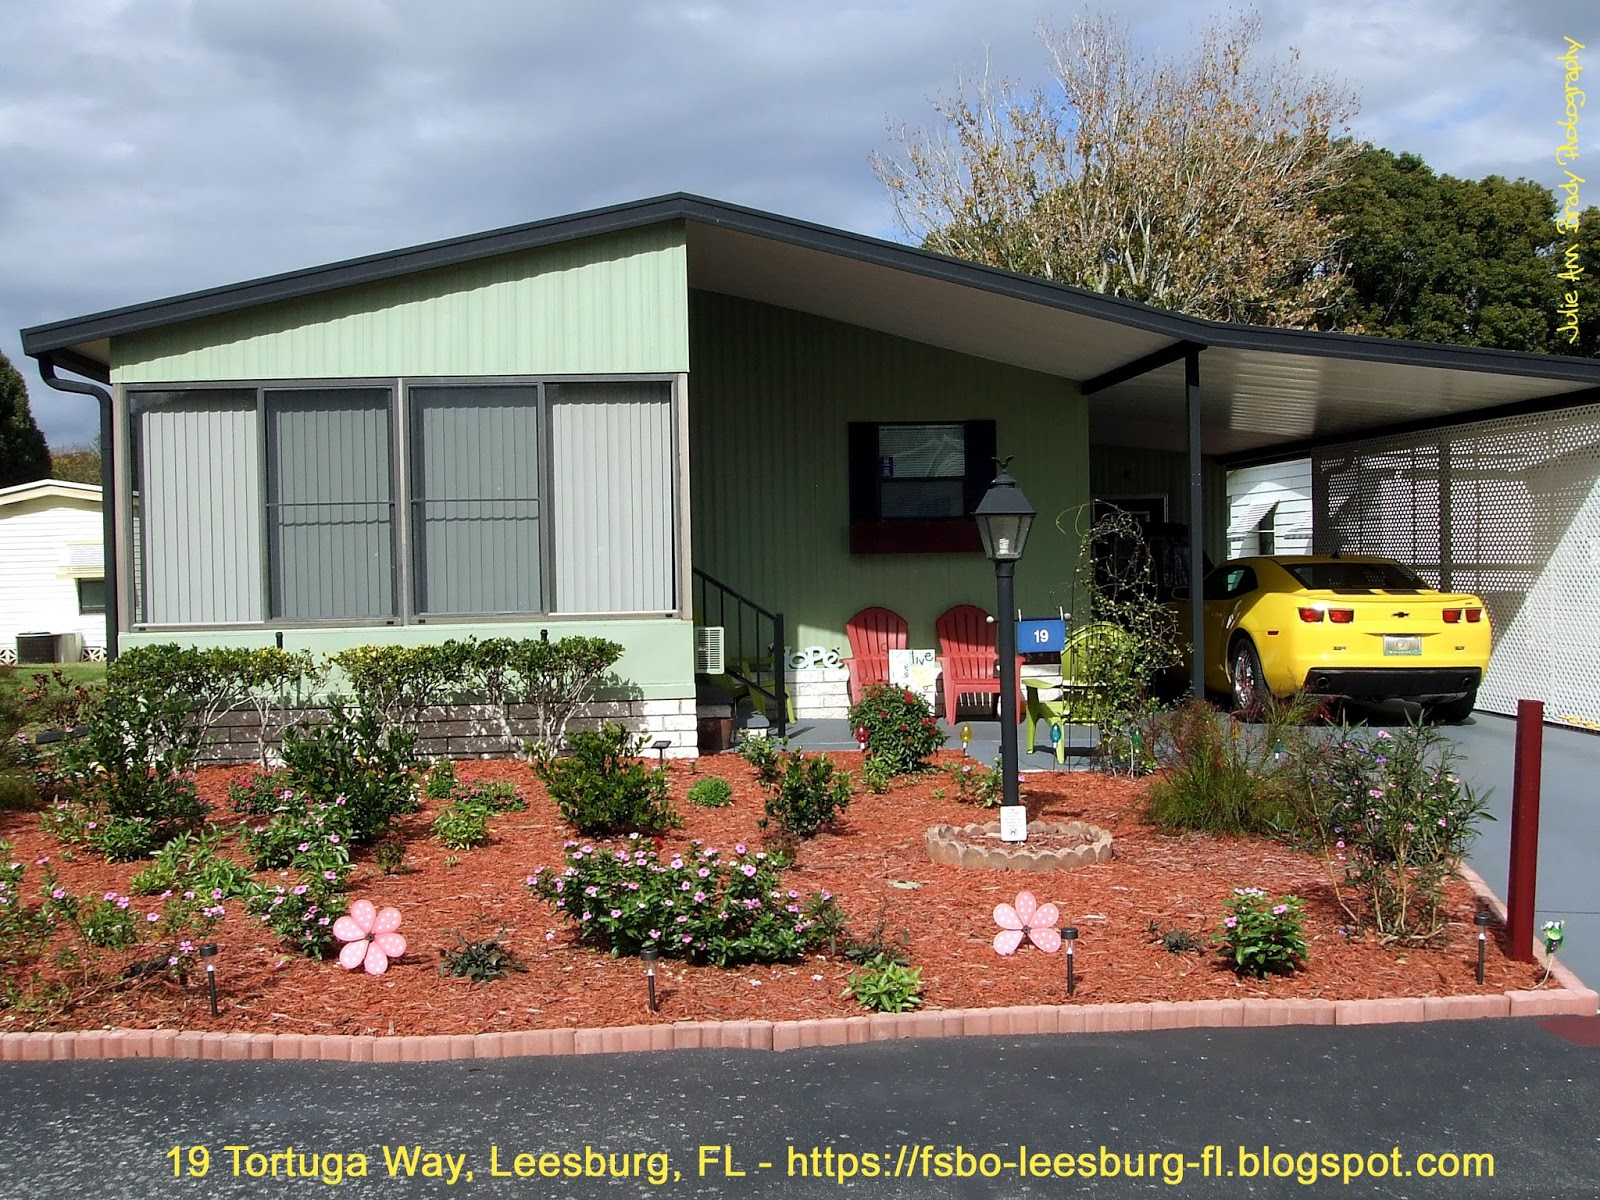 Julie Ann Brady : Blog On: Creating Curb Appeal With A Garden